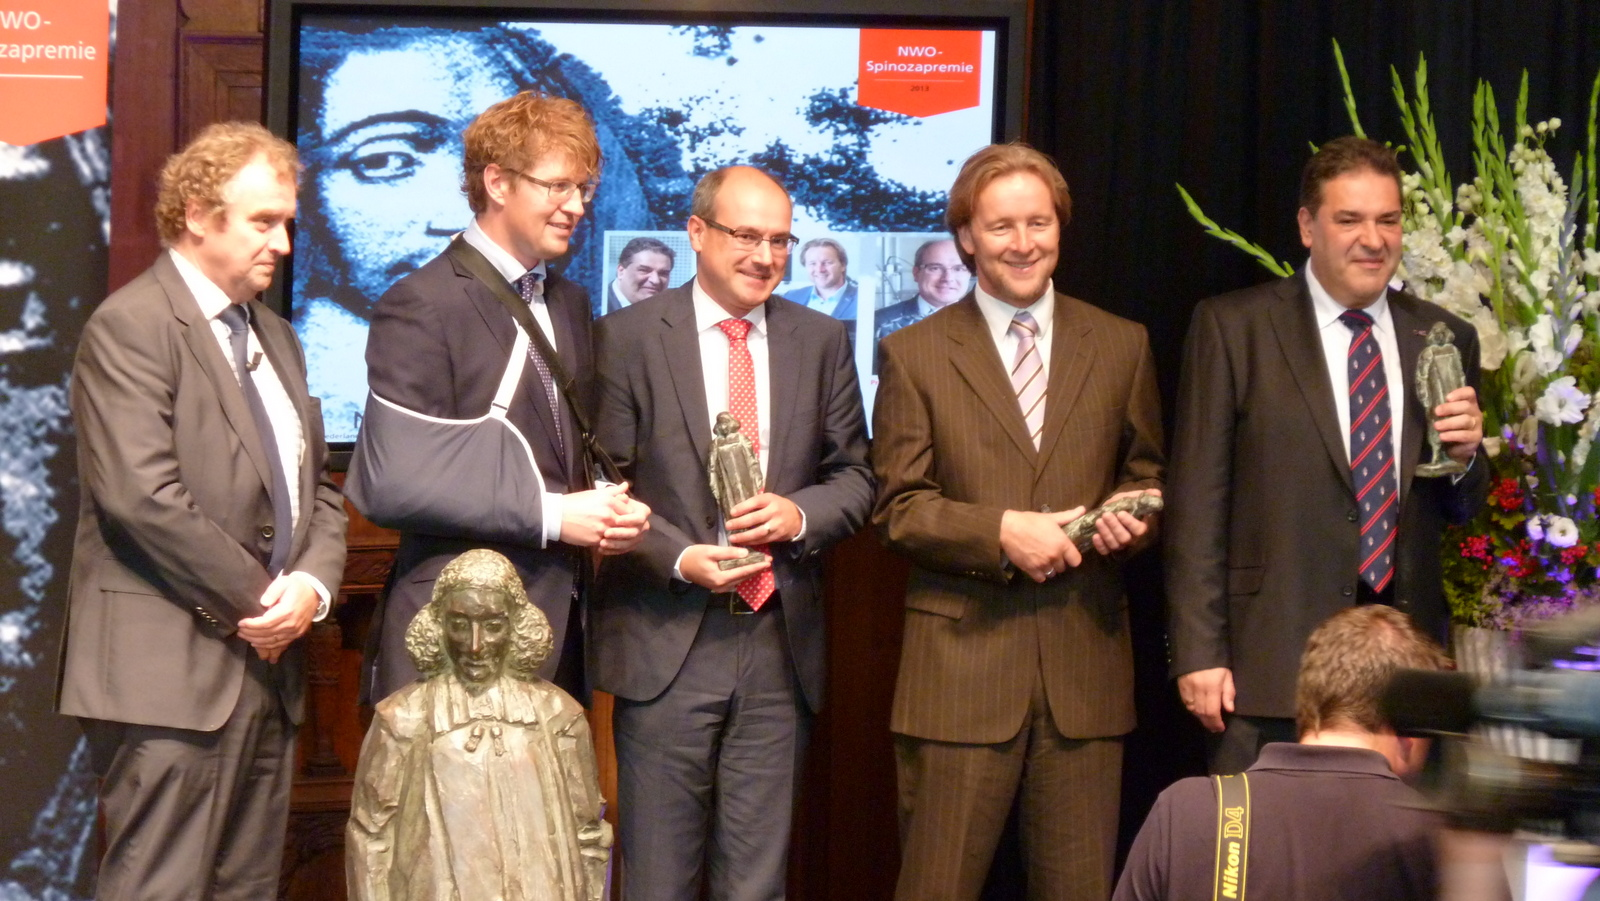 NWO Chair Jos Engelen, State Secretary for Education, Culture and Science Sander Dekker and NWO Spinoza laureates Bert Weckhuysen, Piek Vossen en Mikhail Katsnelson